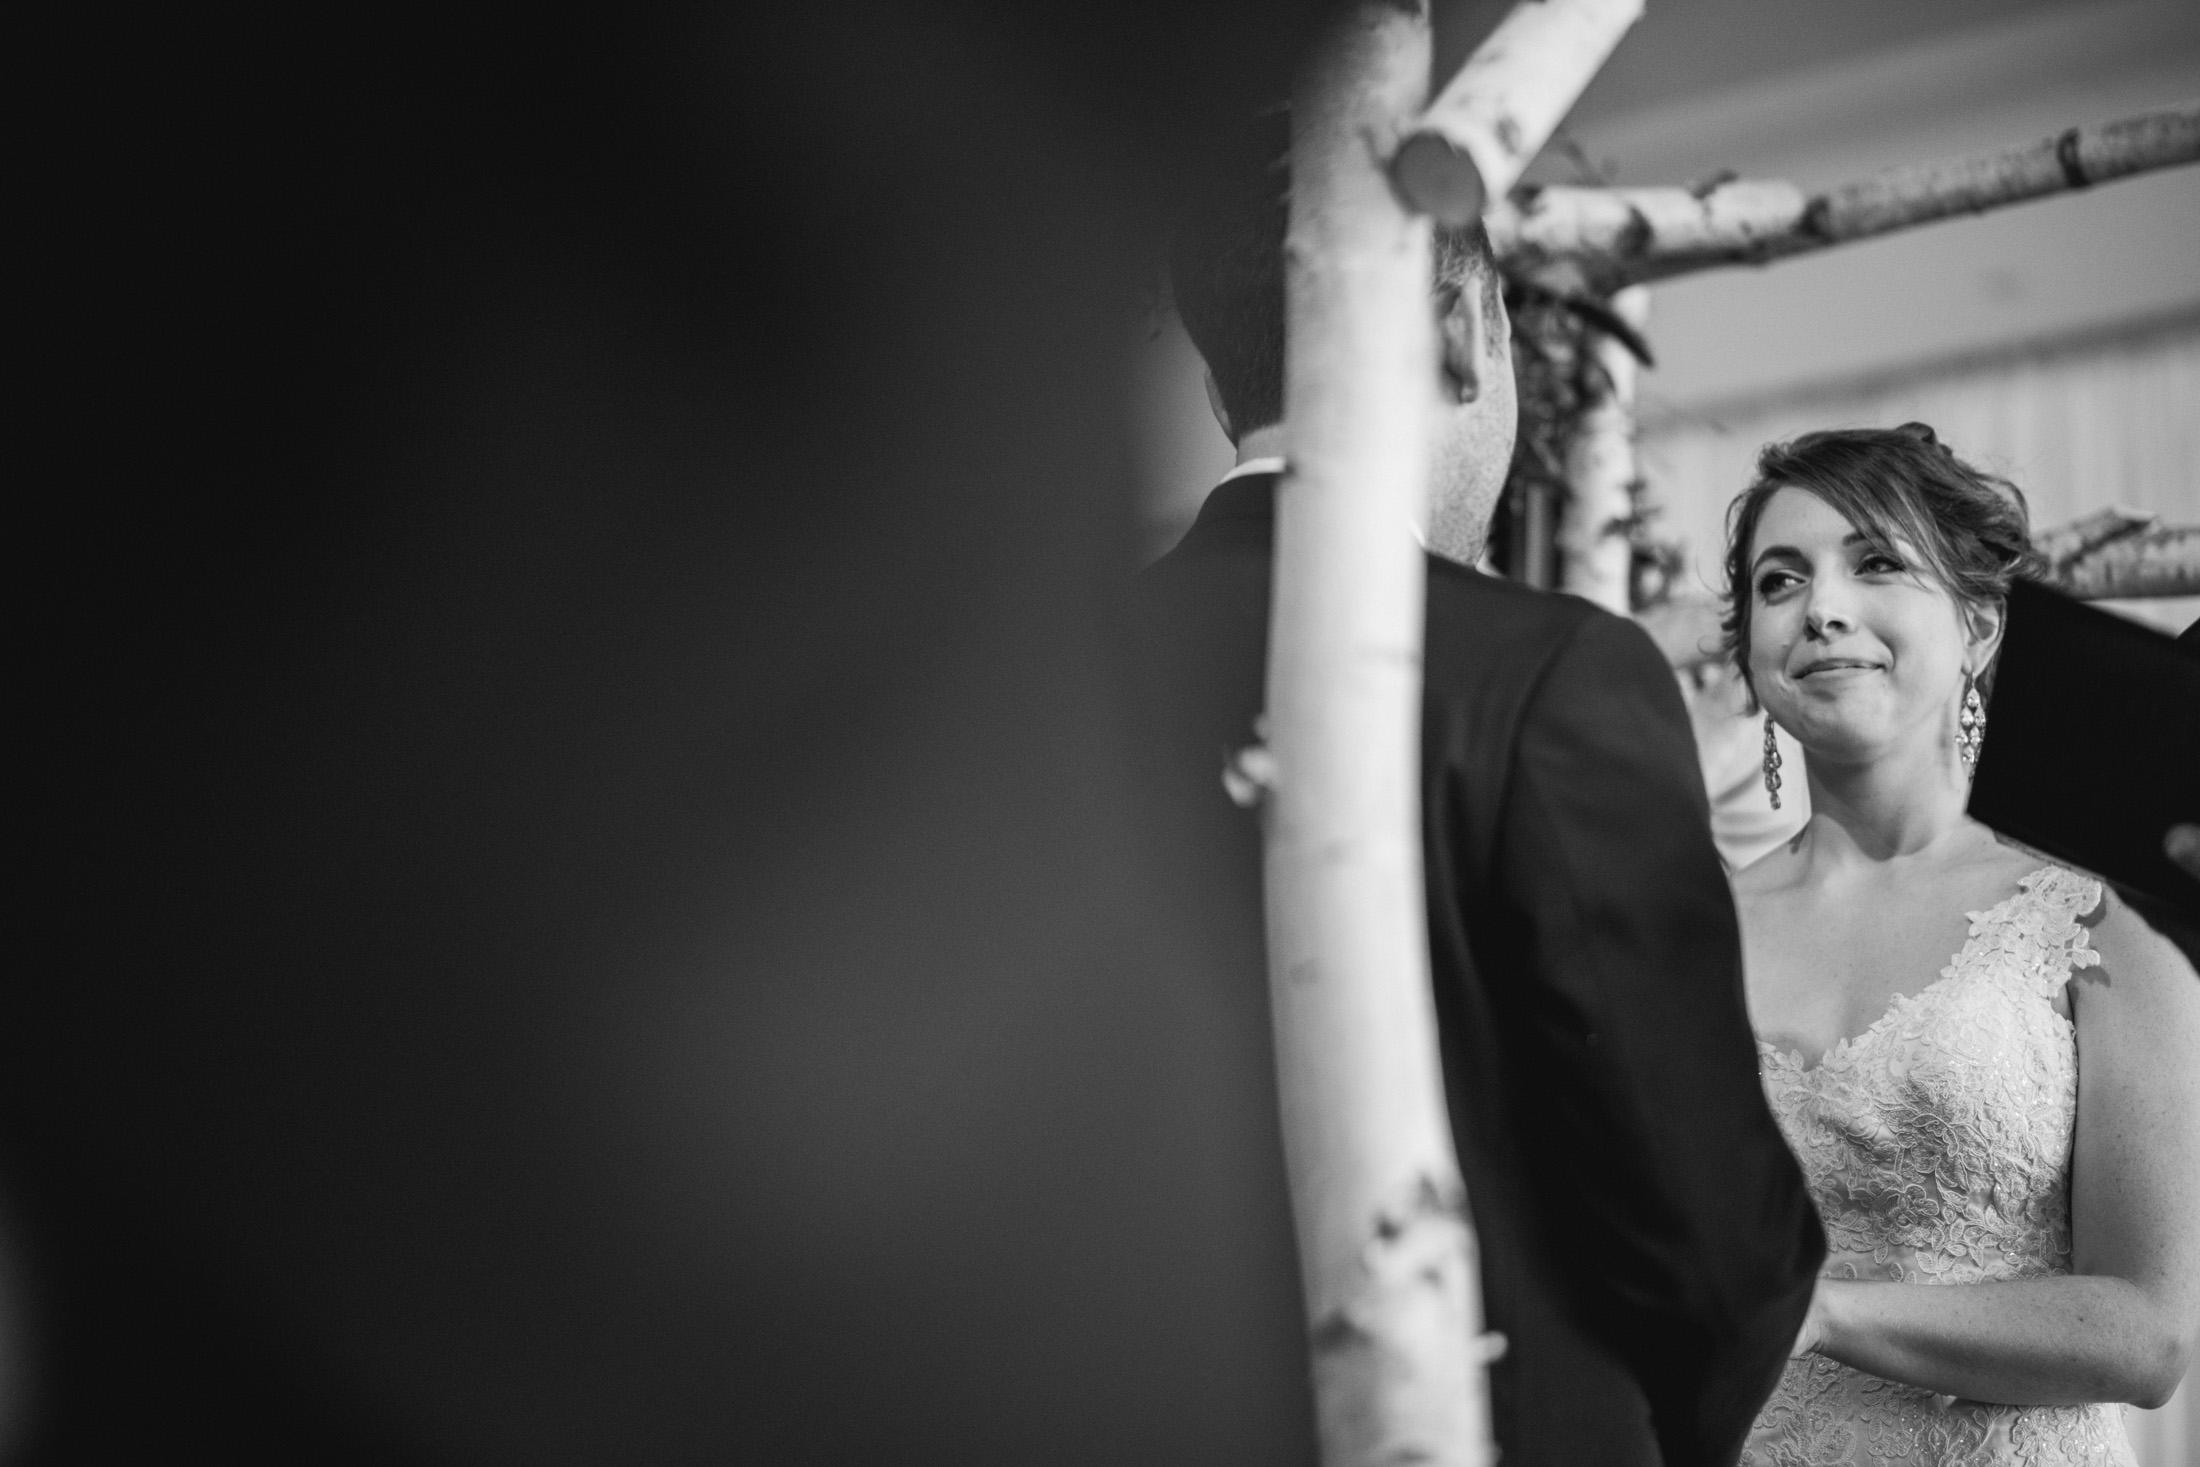 Cruiseport-Wedding-Photographer-16.jpg